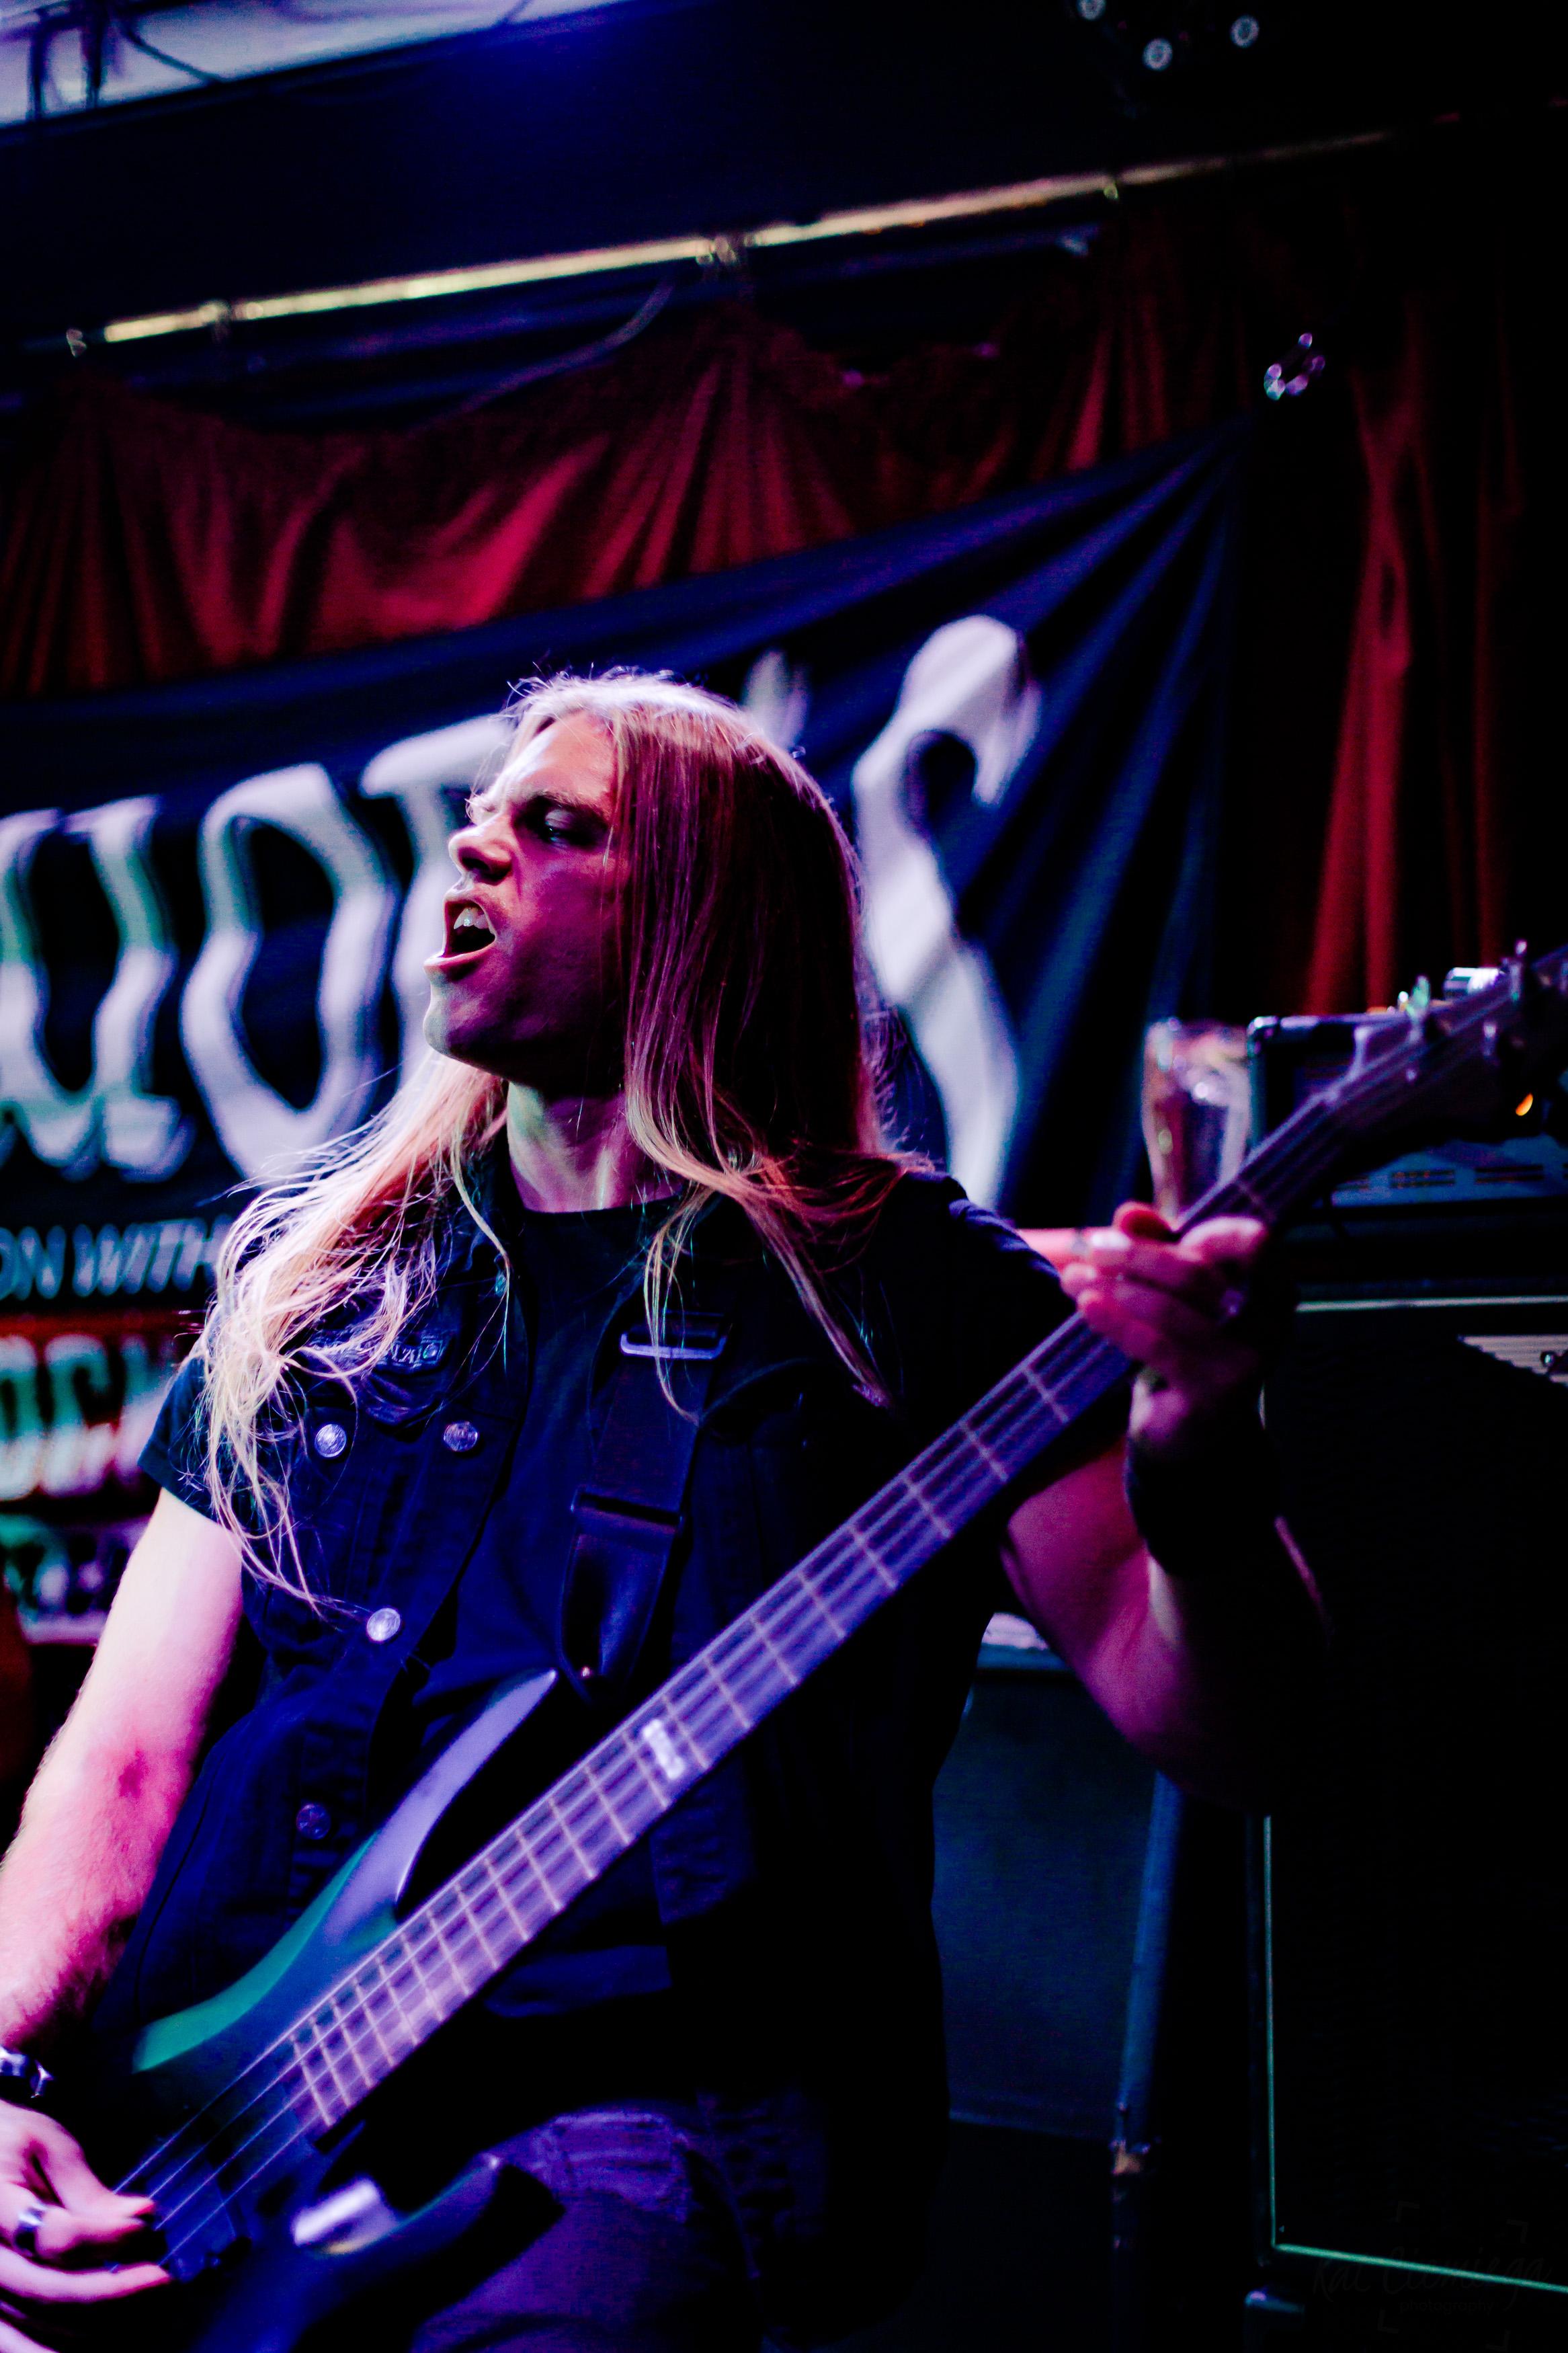 Kat Ciemiega Photography, Metalworks, The Monarch Camden, Camden, Concert Photography, Jake Thorsen